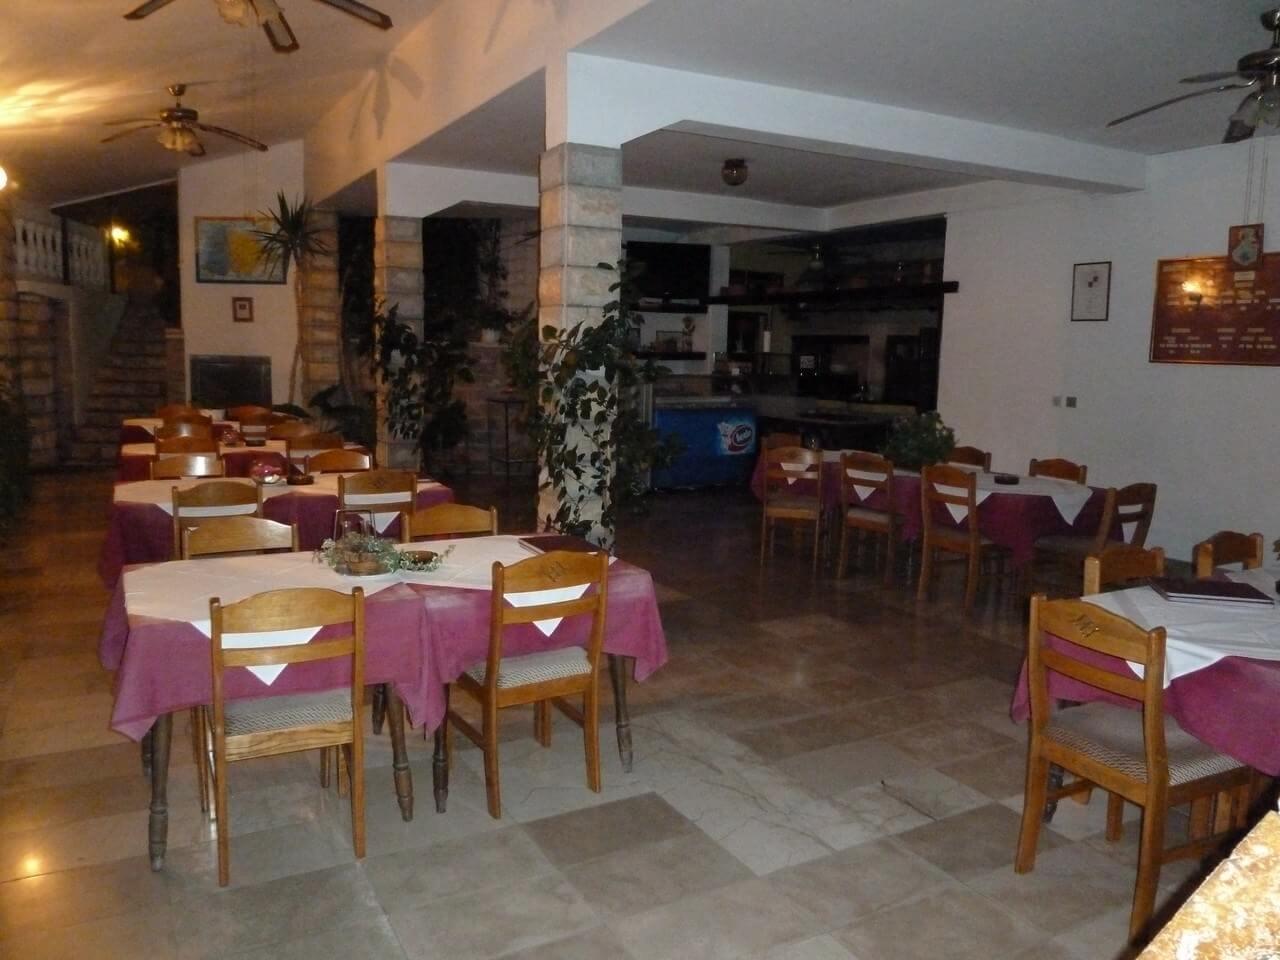 Restoran Ljetni san